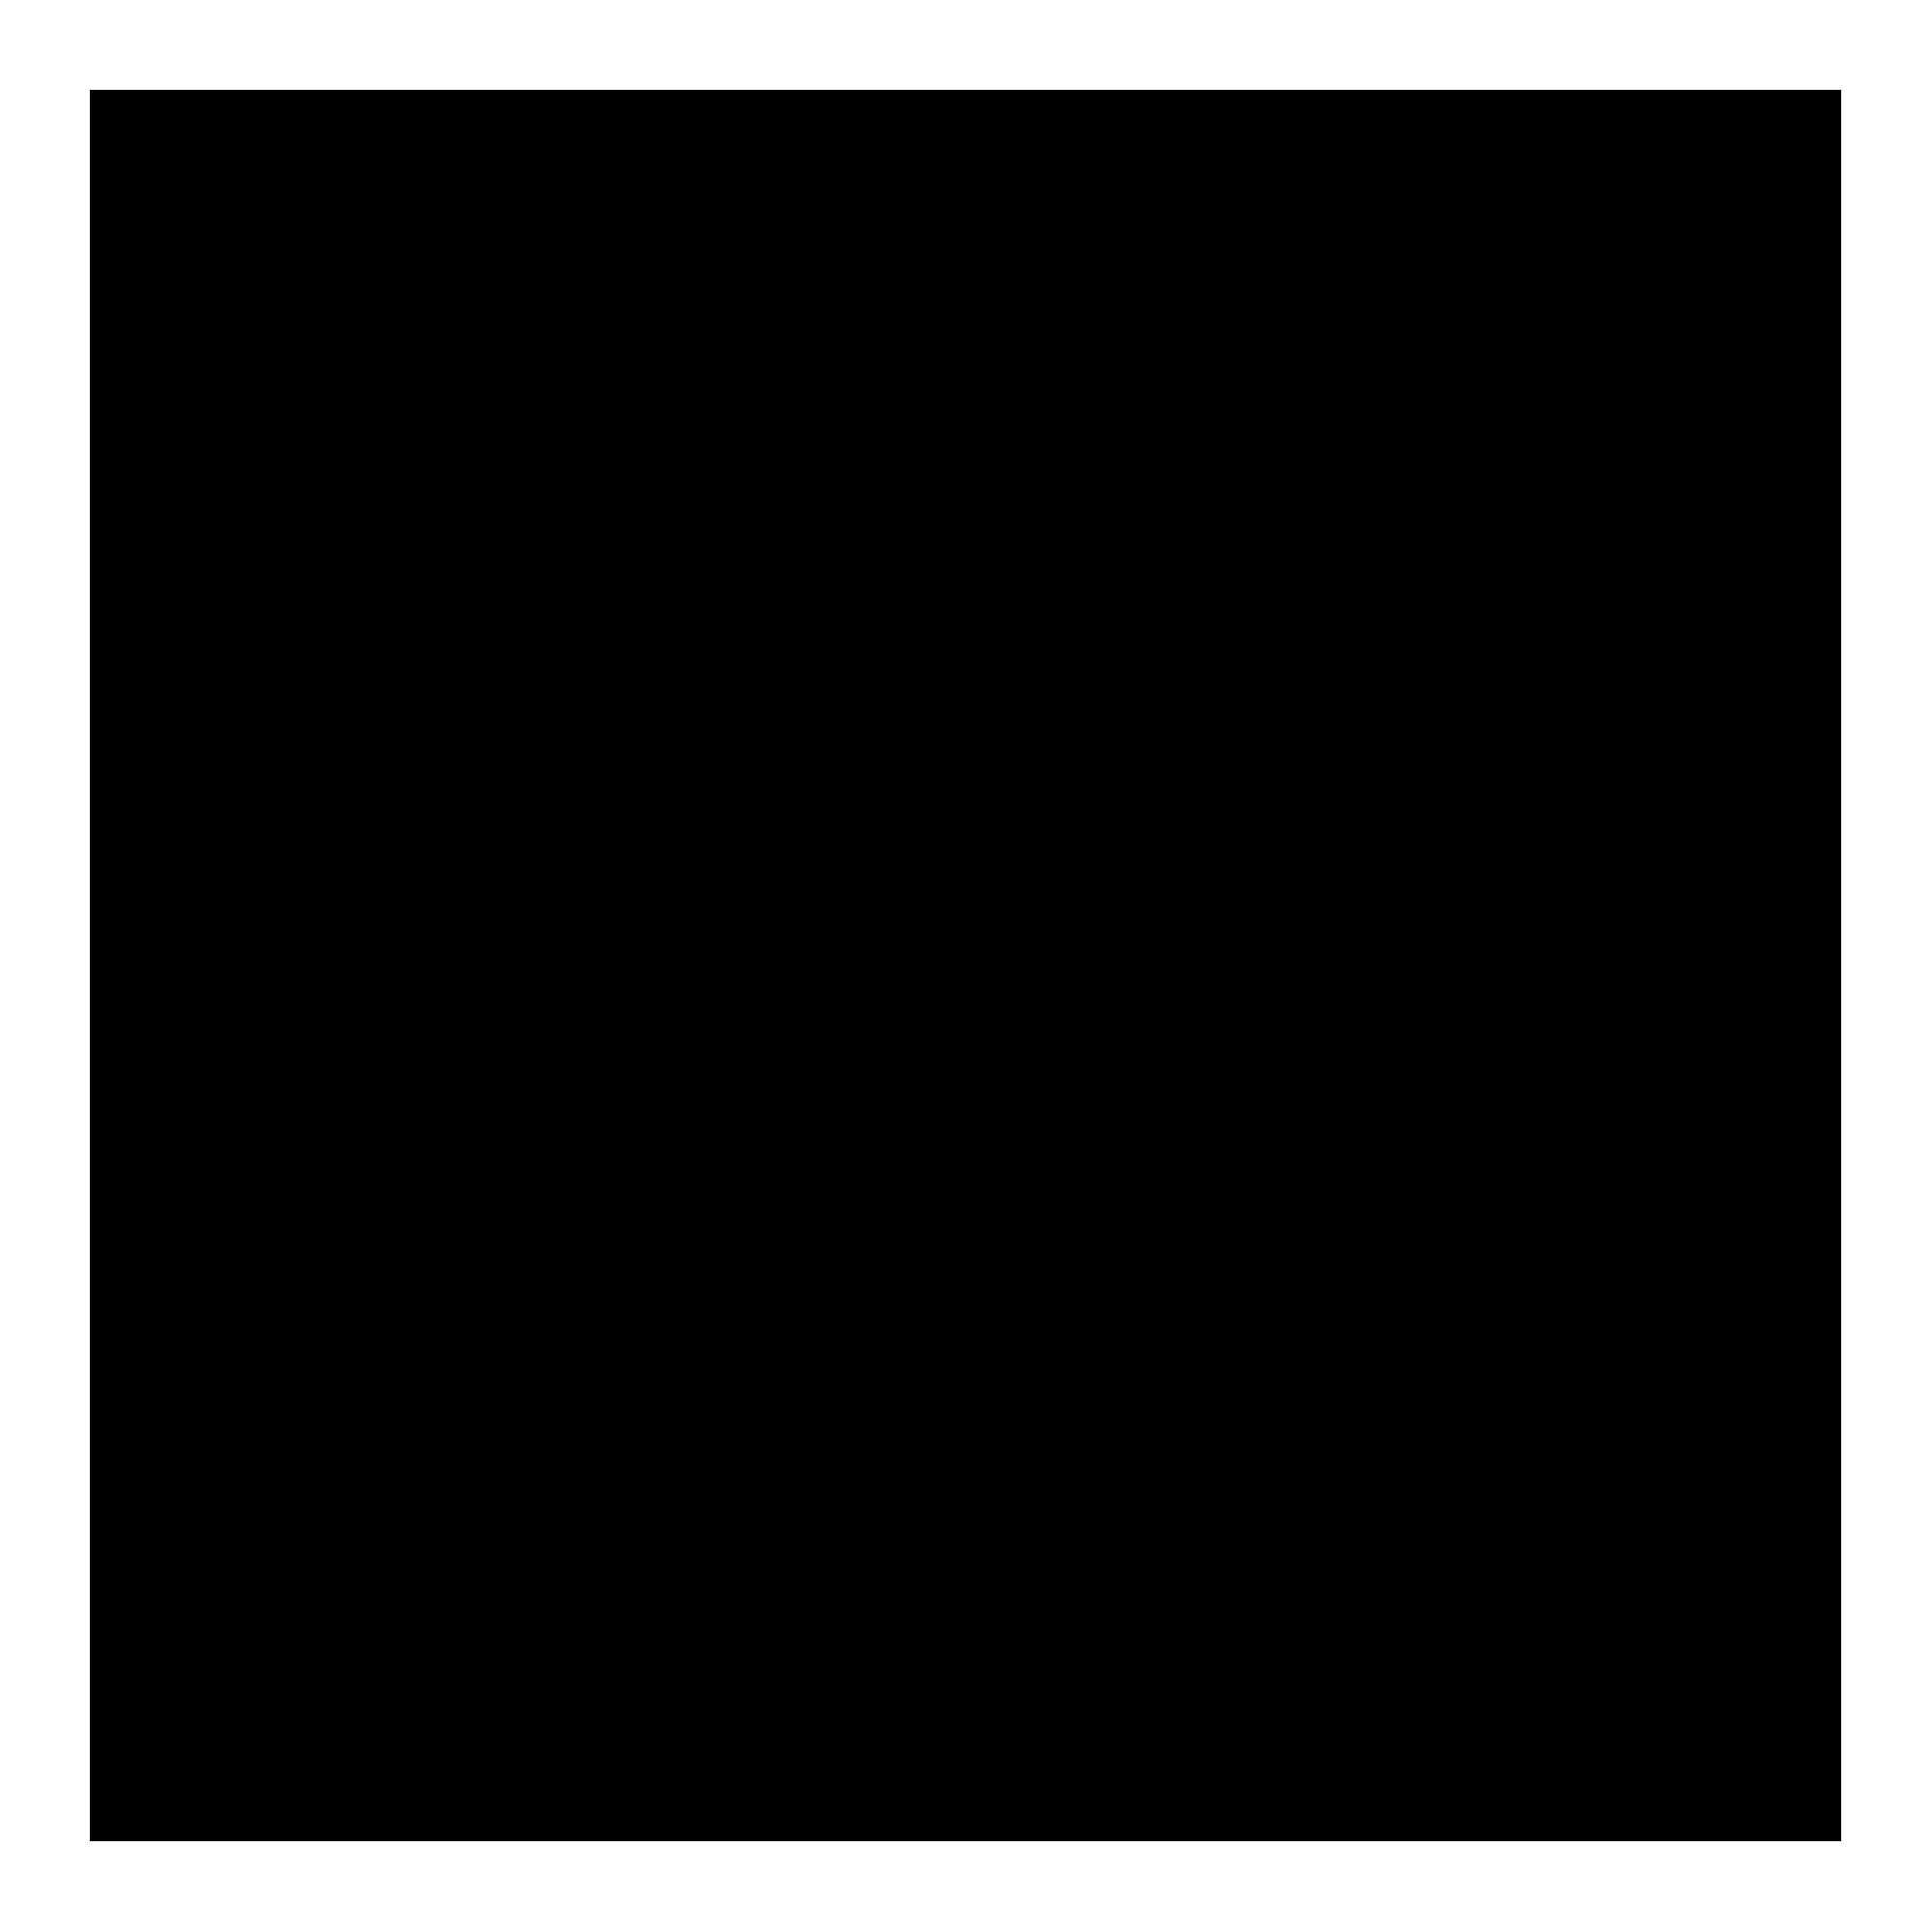 colaboradora-black